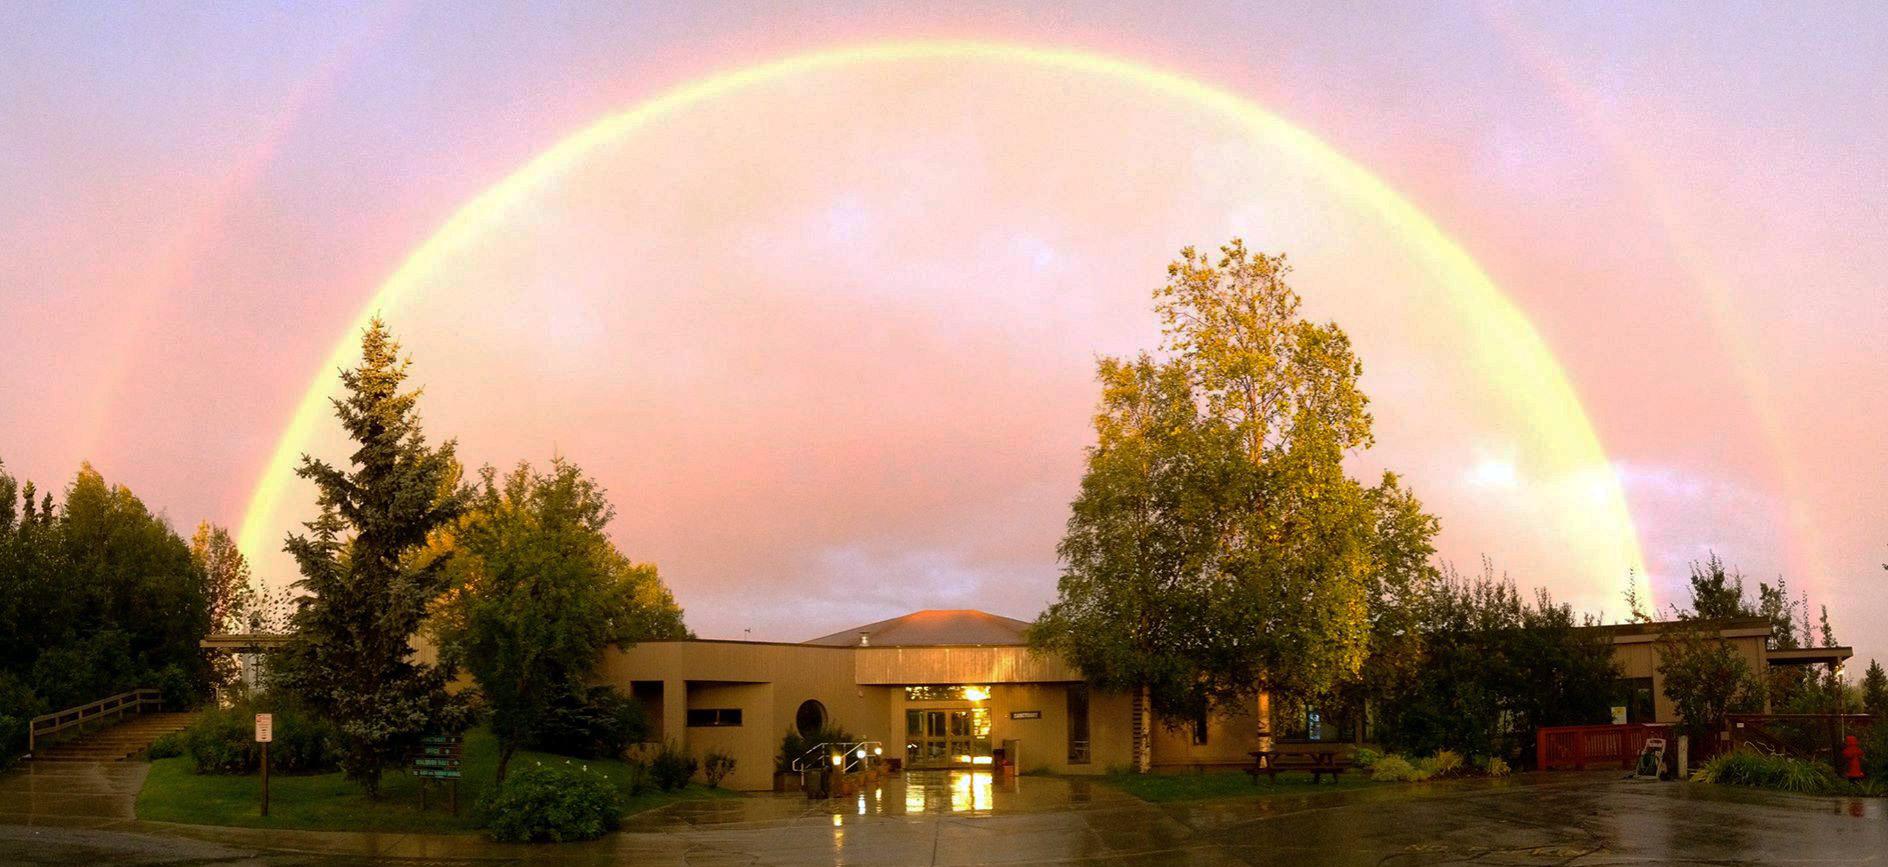 st-marys-double-rainbow-photo-color-adjusted_914